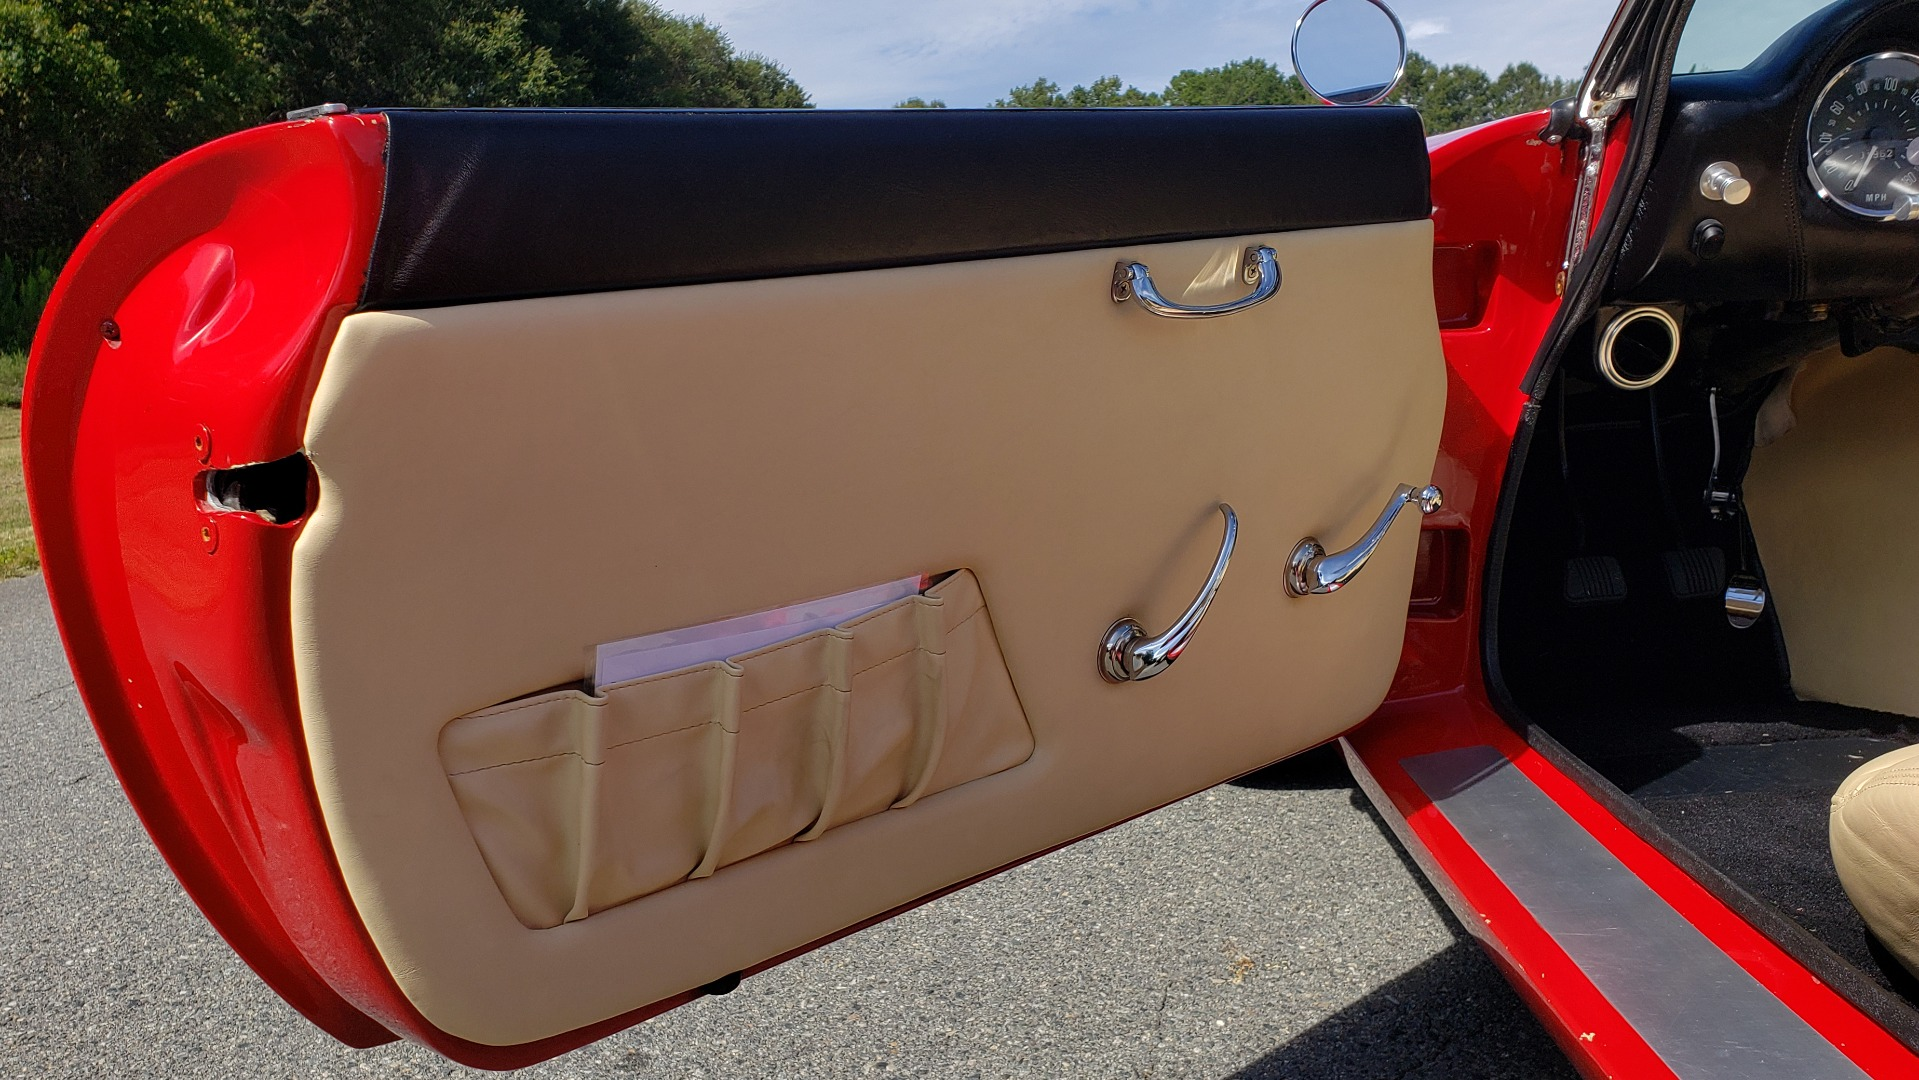 Used 1961 Ferrari 250GT SWB CALIFORNIA REPLICA / 302CI V8 / TREMEC 5-SPEED for sale Sold at Formula Imports in Charlotte NC 28227 20